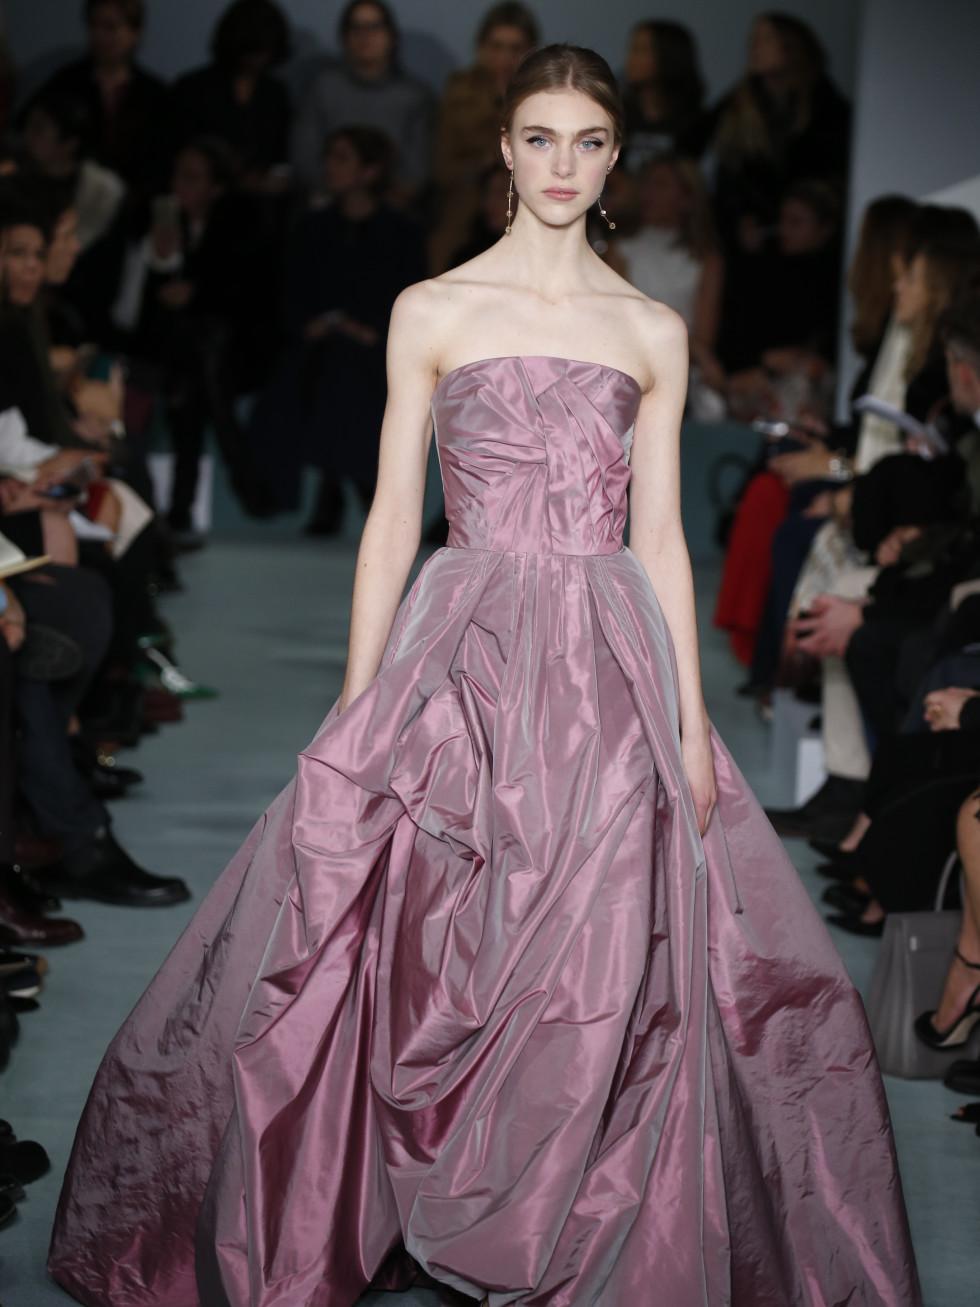 Oscar de la Renta fall 2016 gown